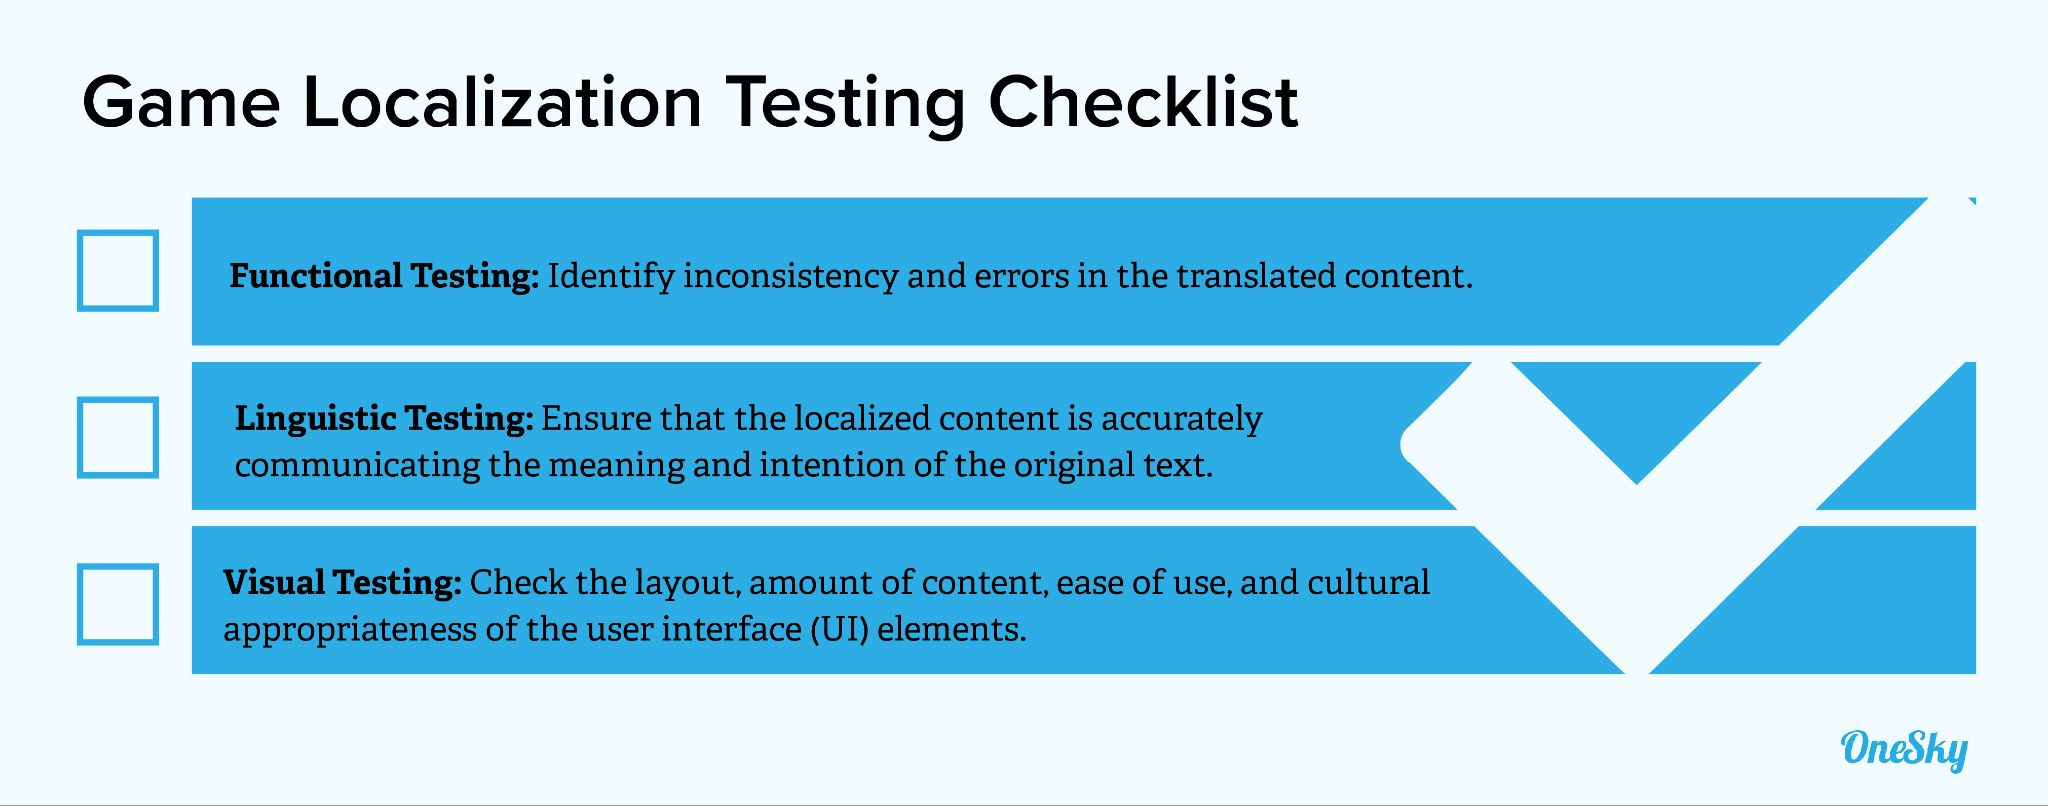 Quality Assurance (QA) and Testing